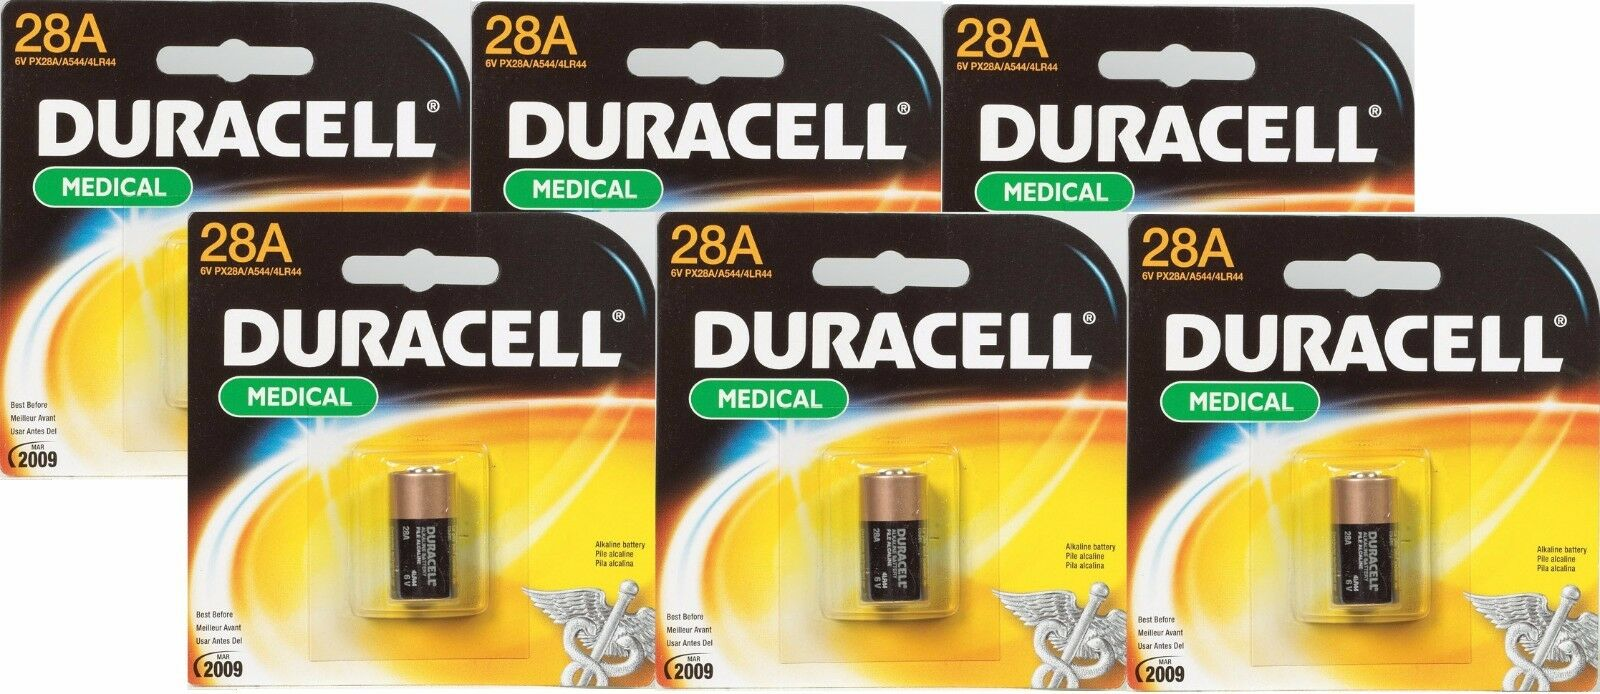 6 Duracell 28a 6v Alkaline Battery Medical Electronics Ph...